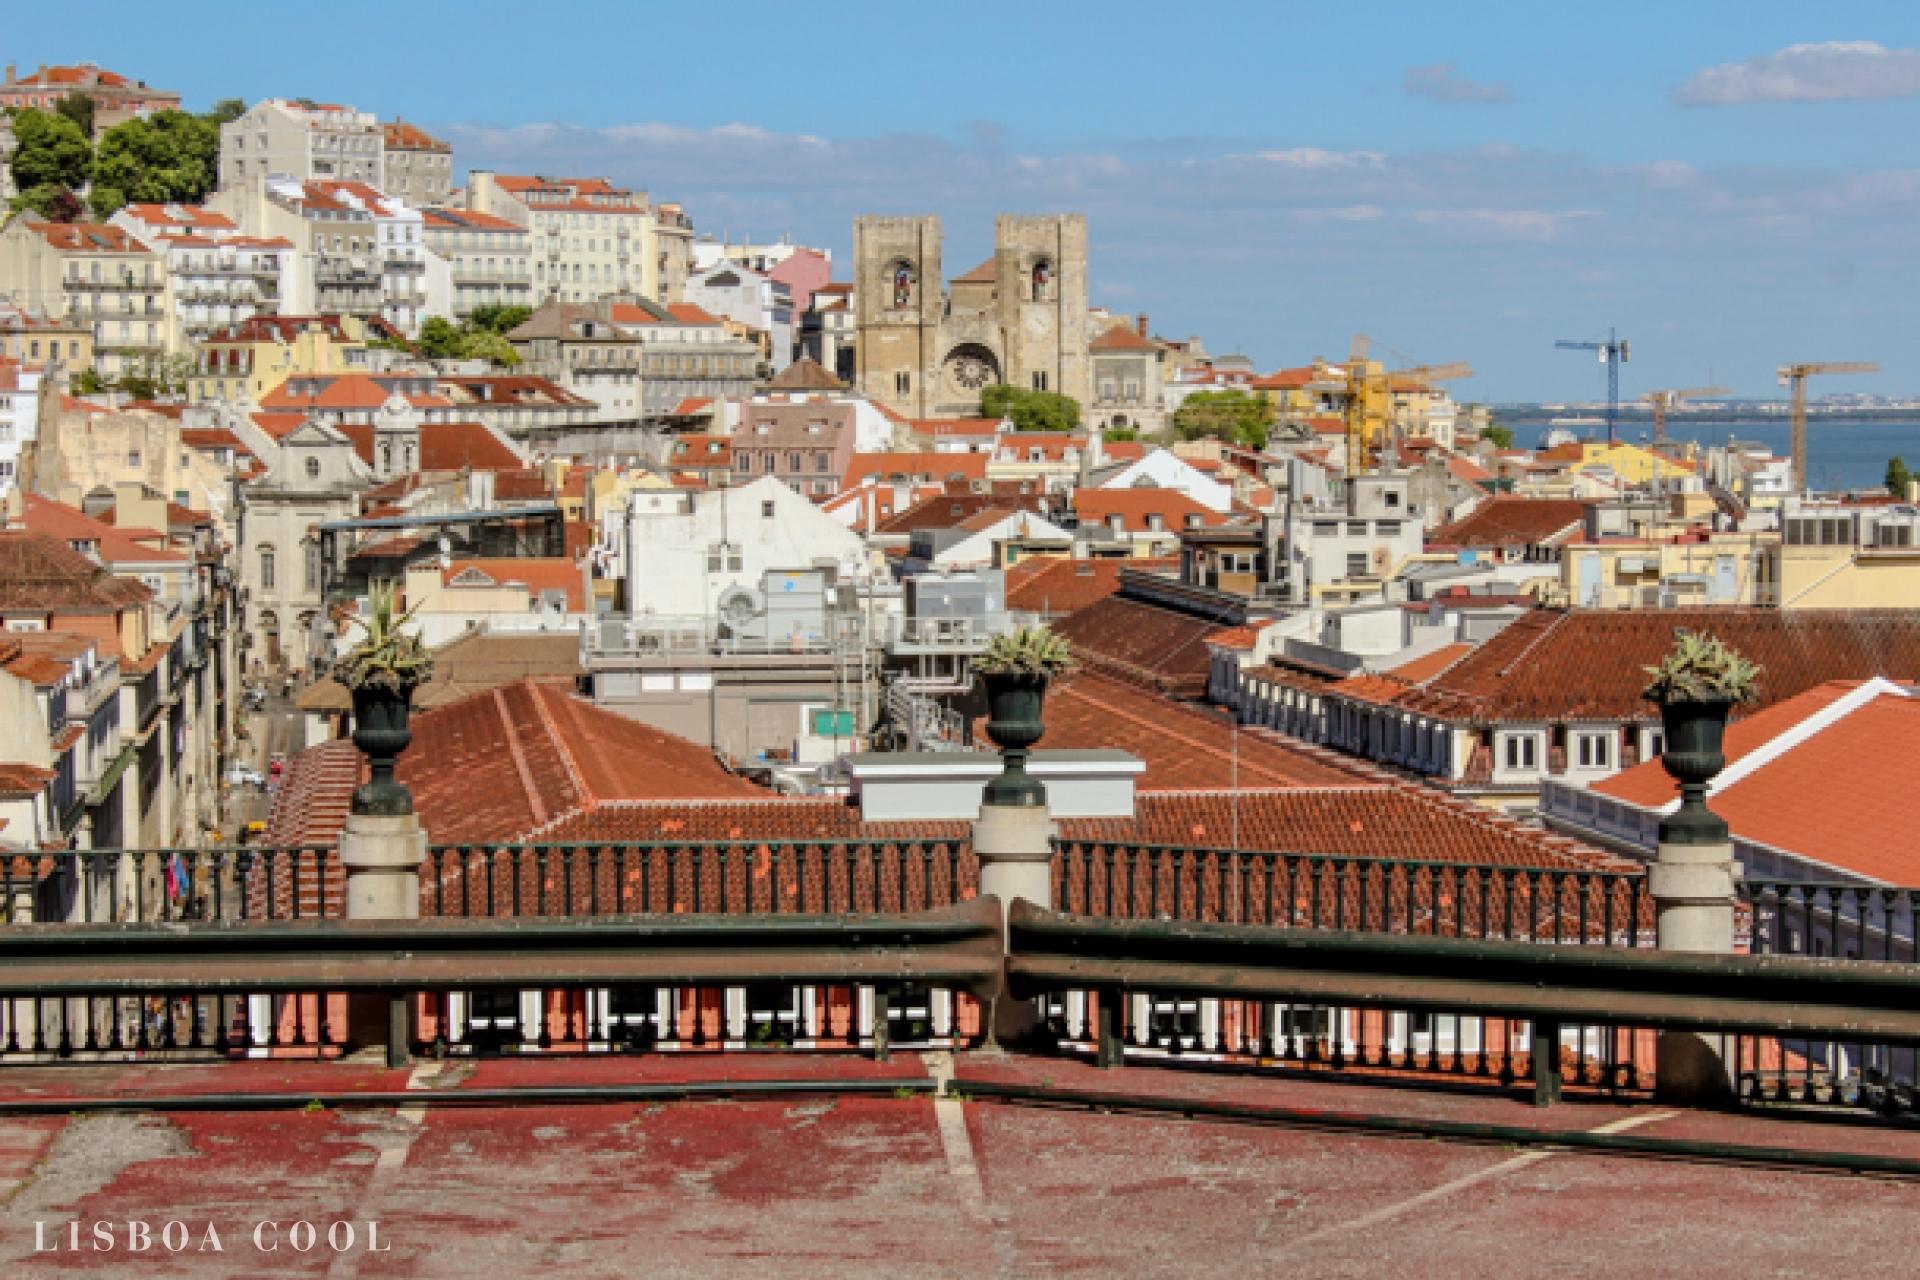 Artesanato Kit Higiene ~ Miradouro Largo da Academia Nacional de Belas Artes Lisboa Cool